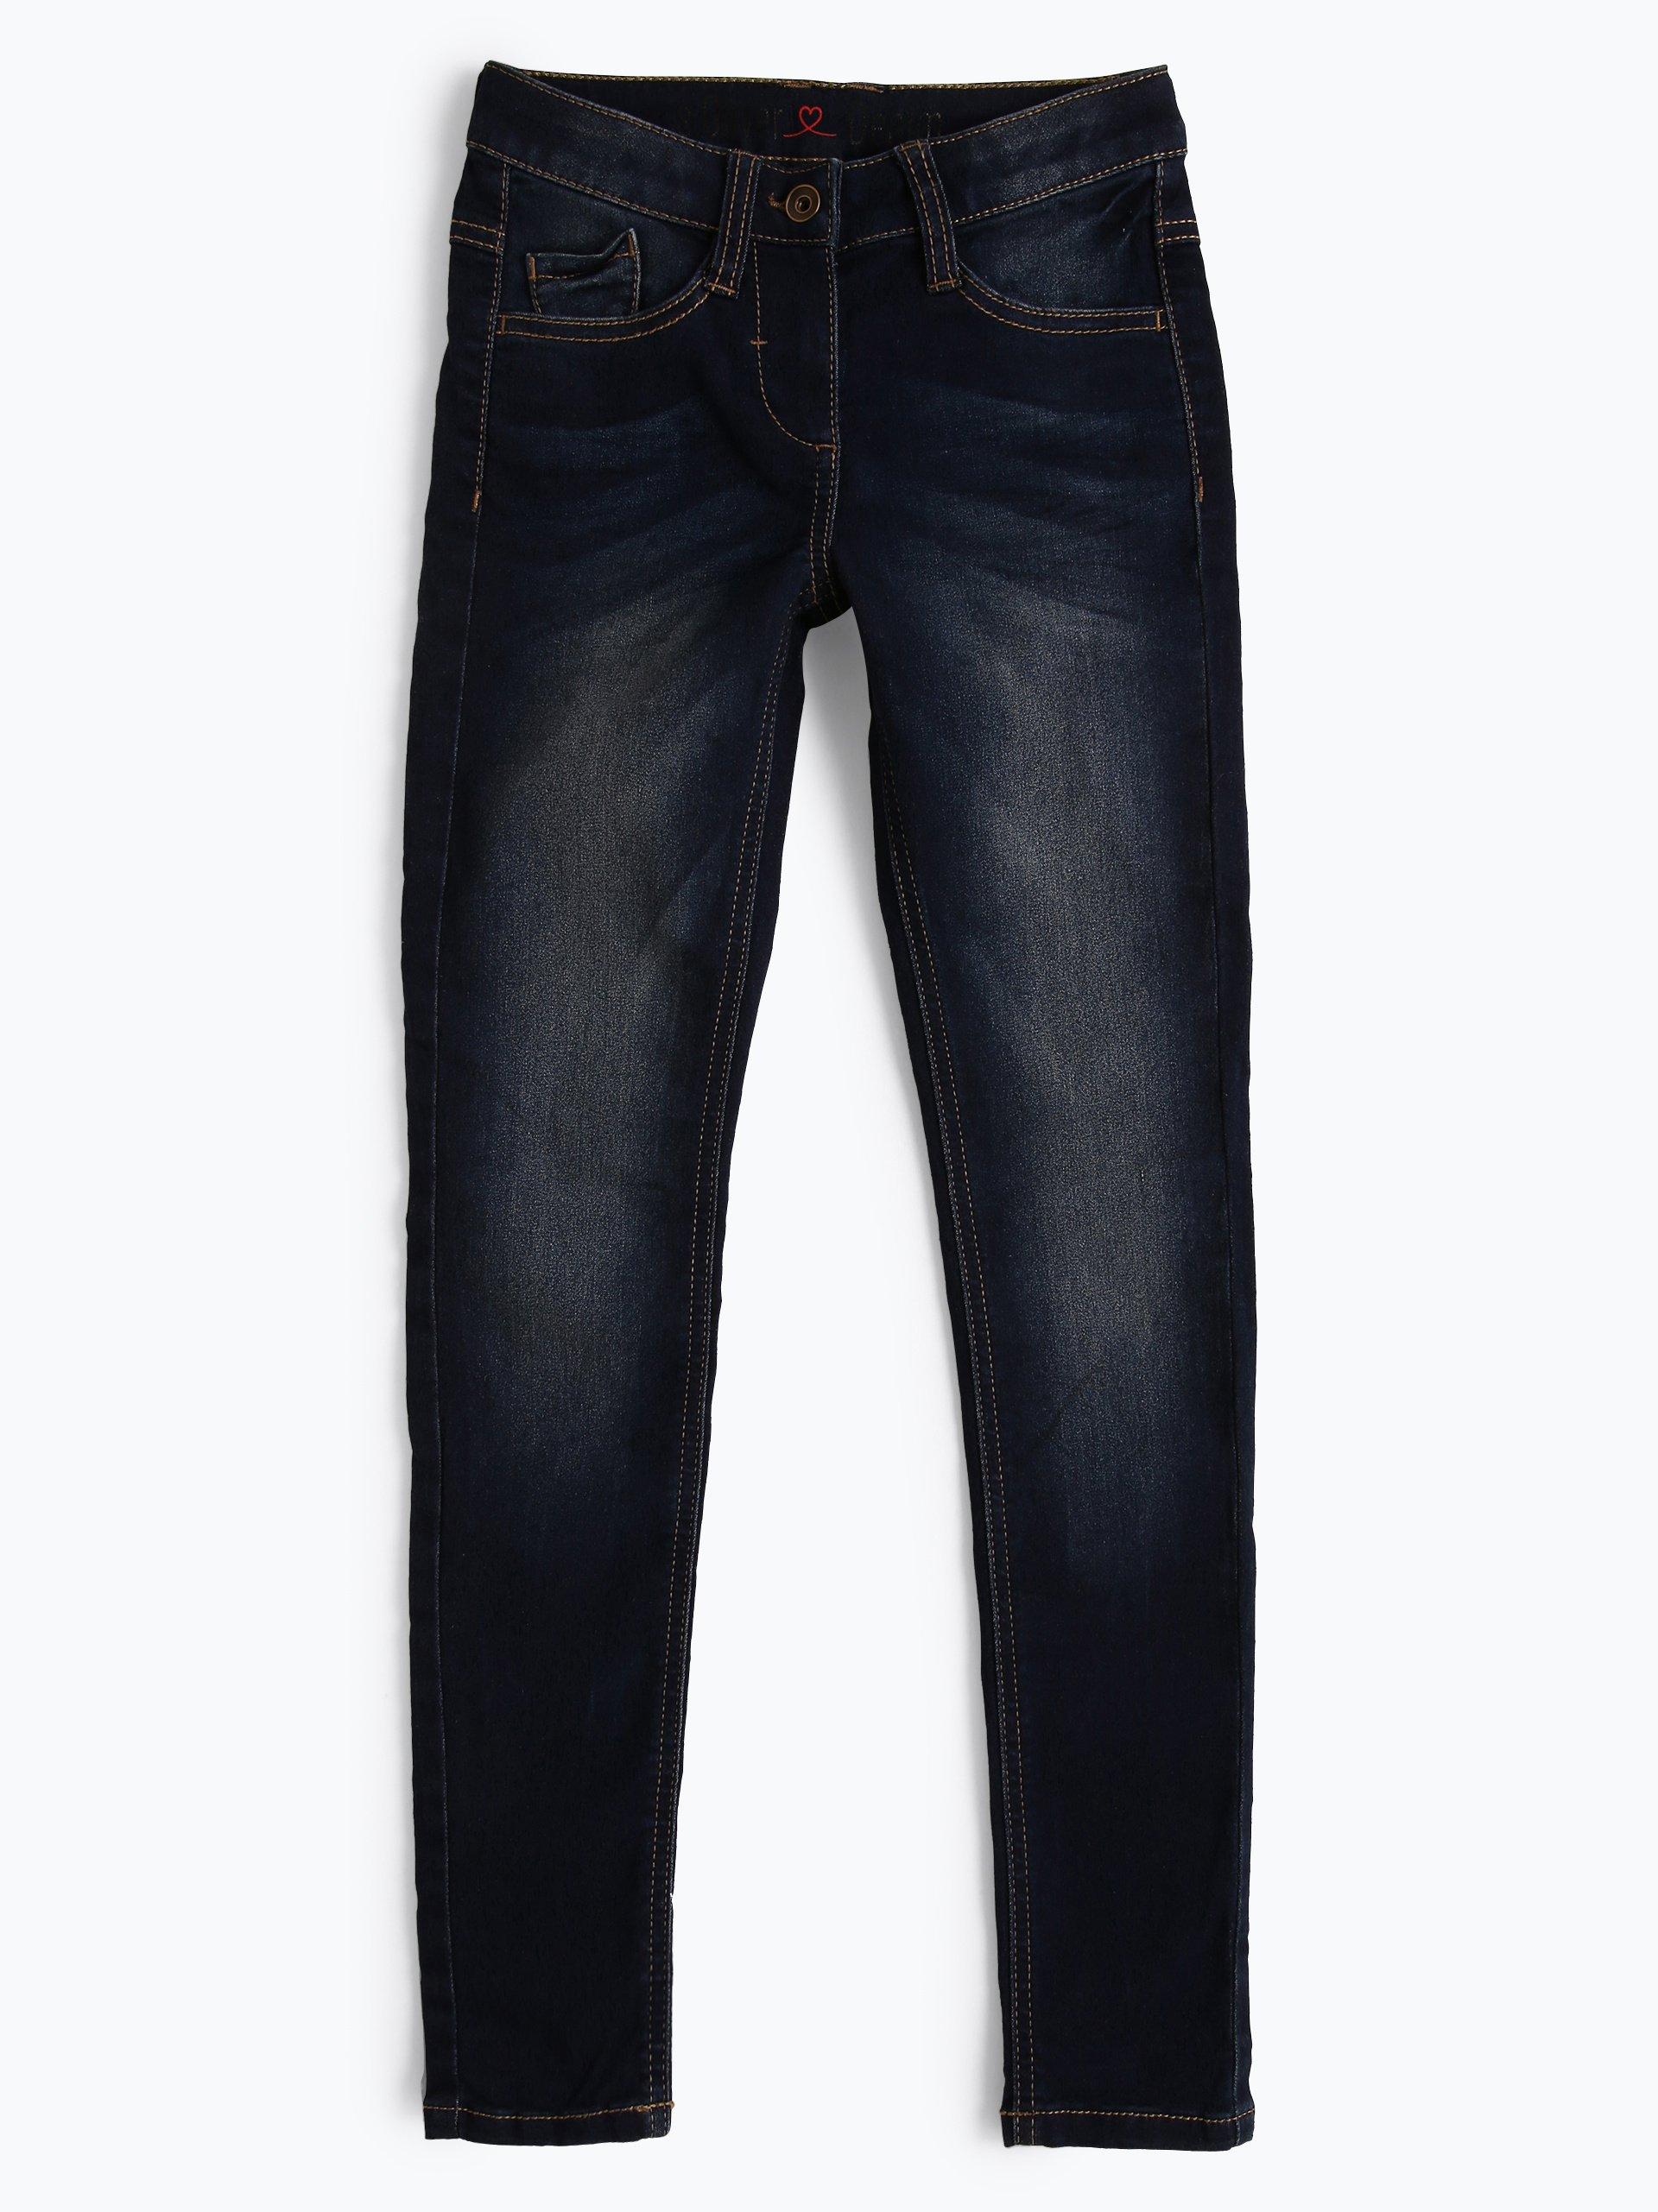 s.Oliver Casual Mädchen Jeans Slim Fit Slim - Skinny Suri